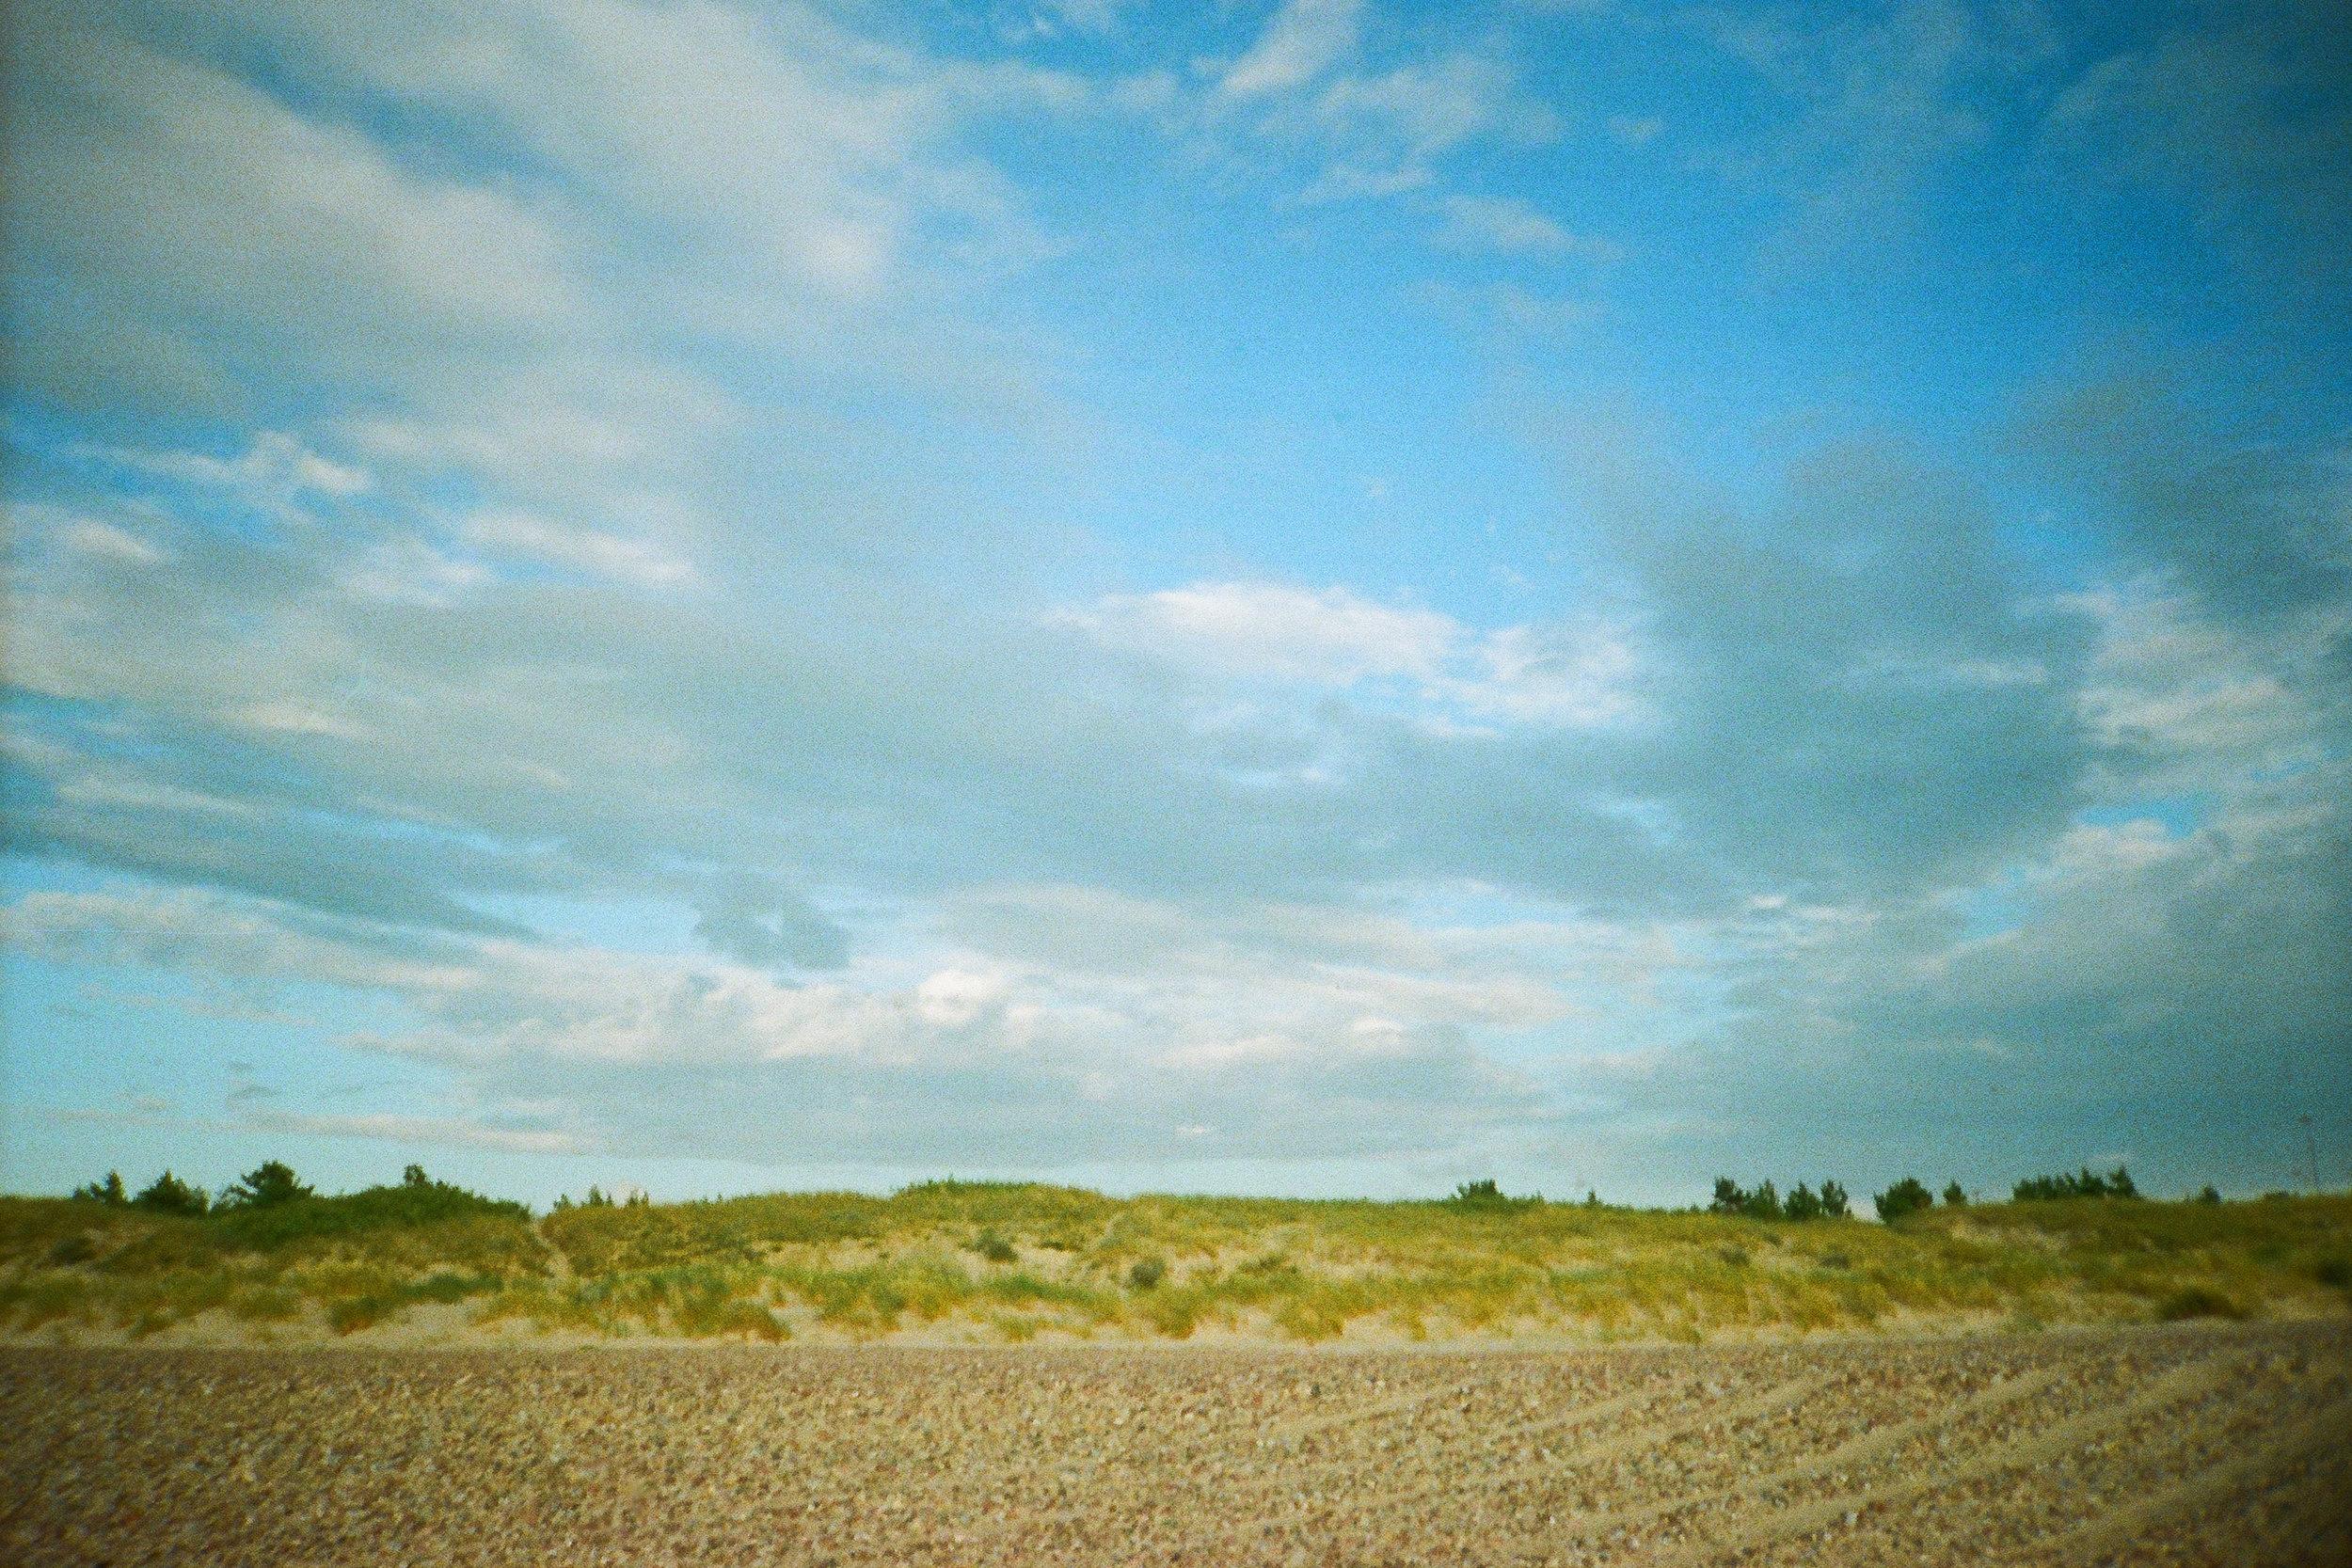 062 www.skutelisfoto.com.jpg